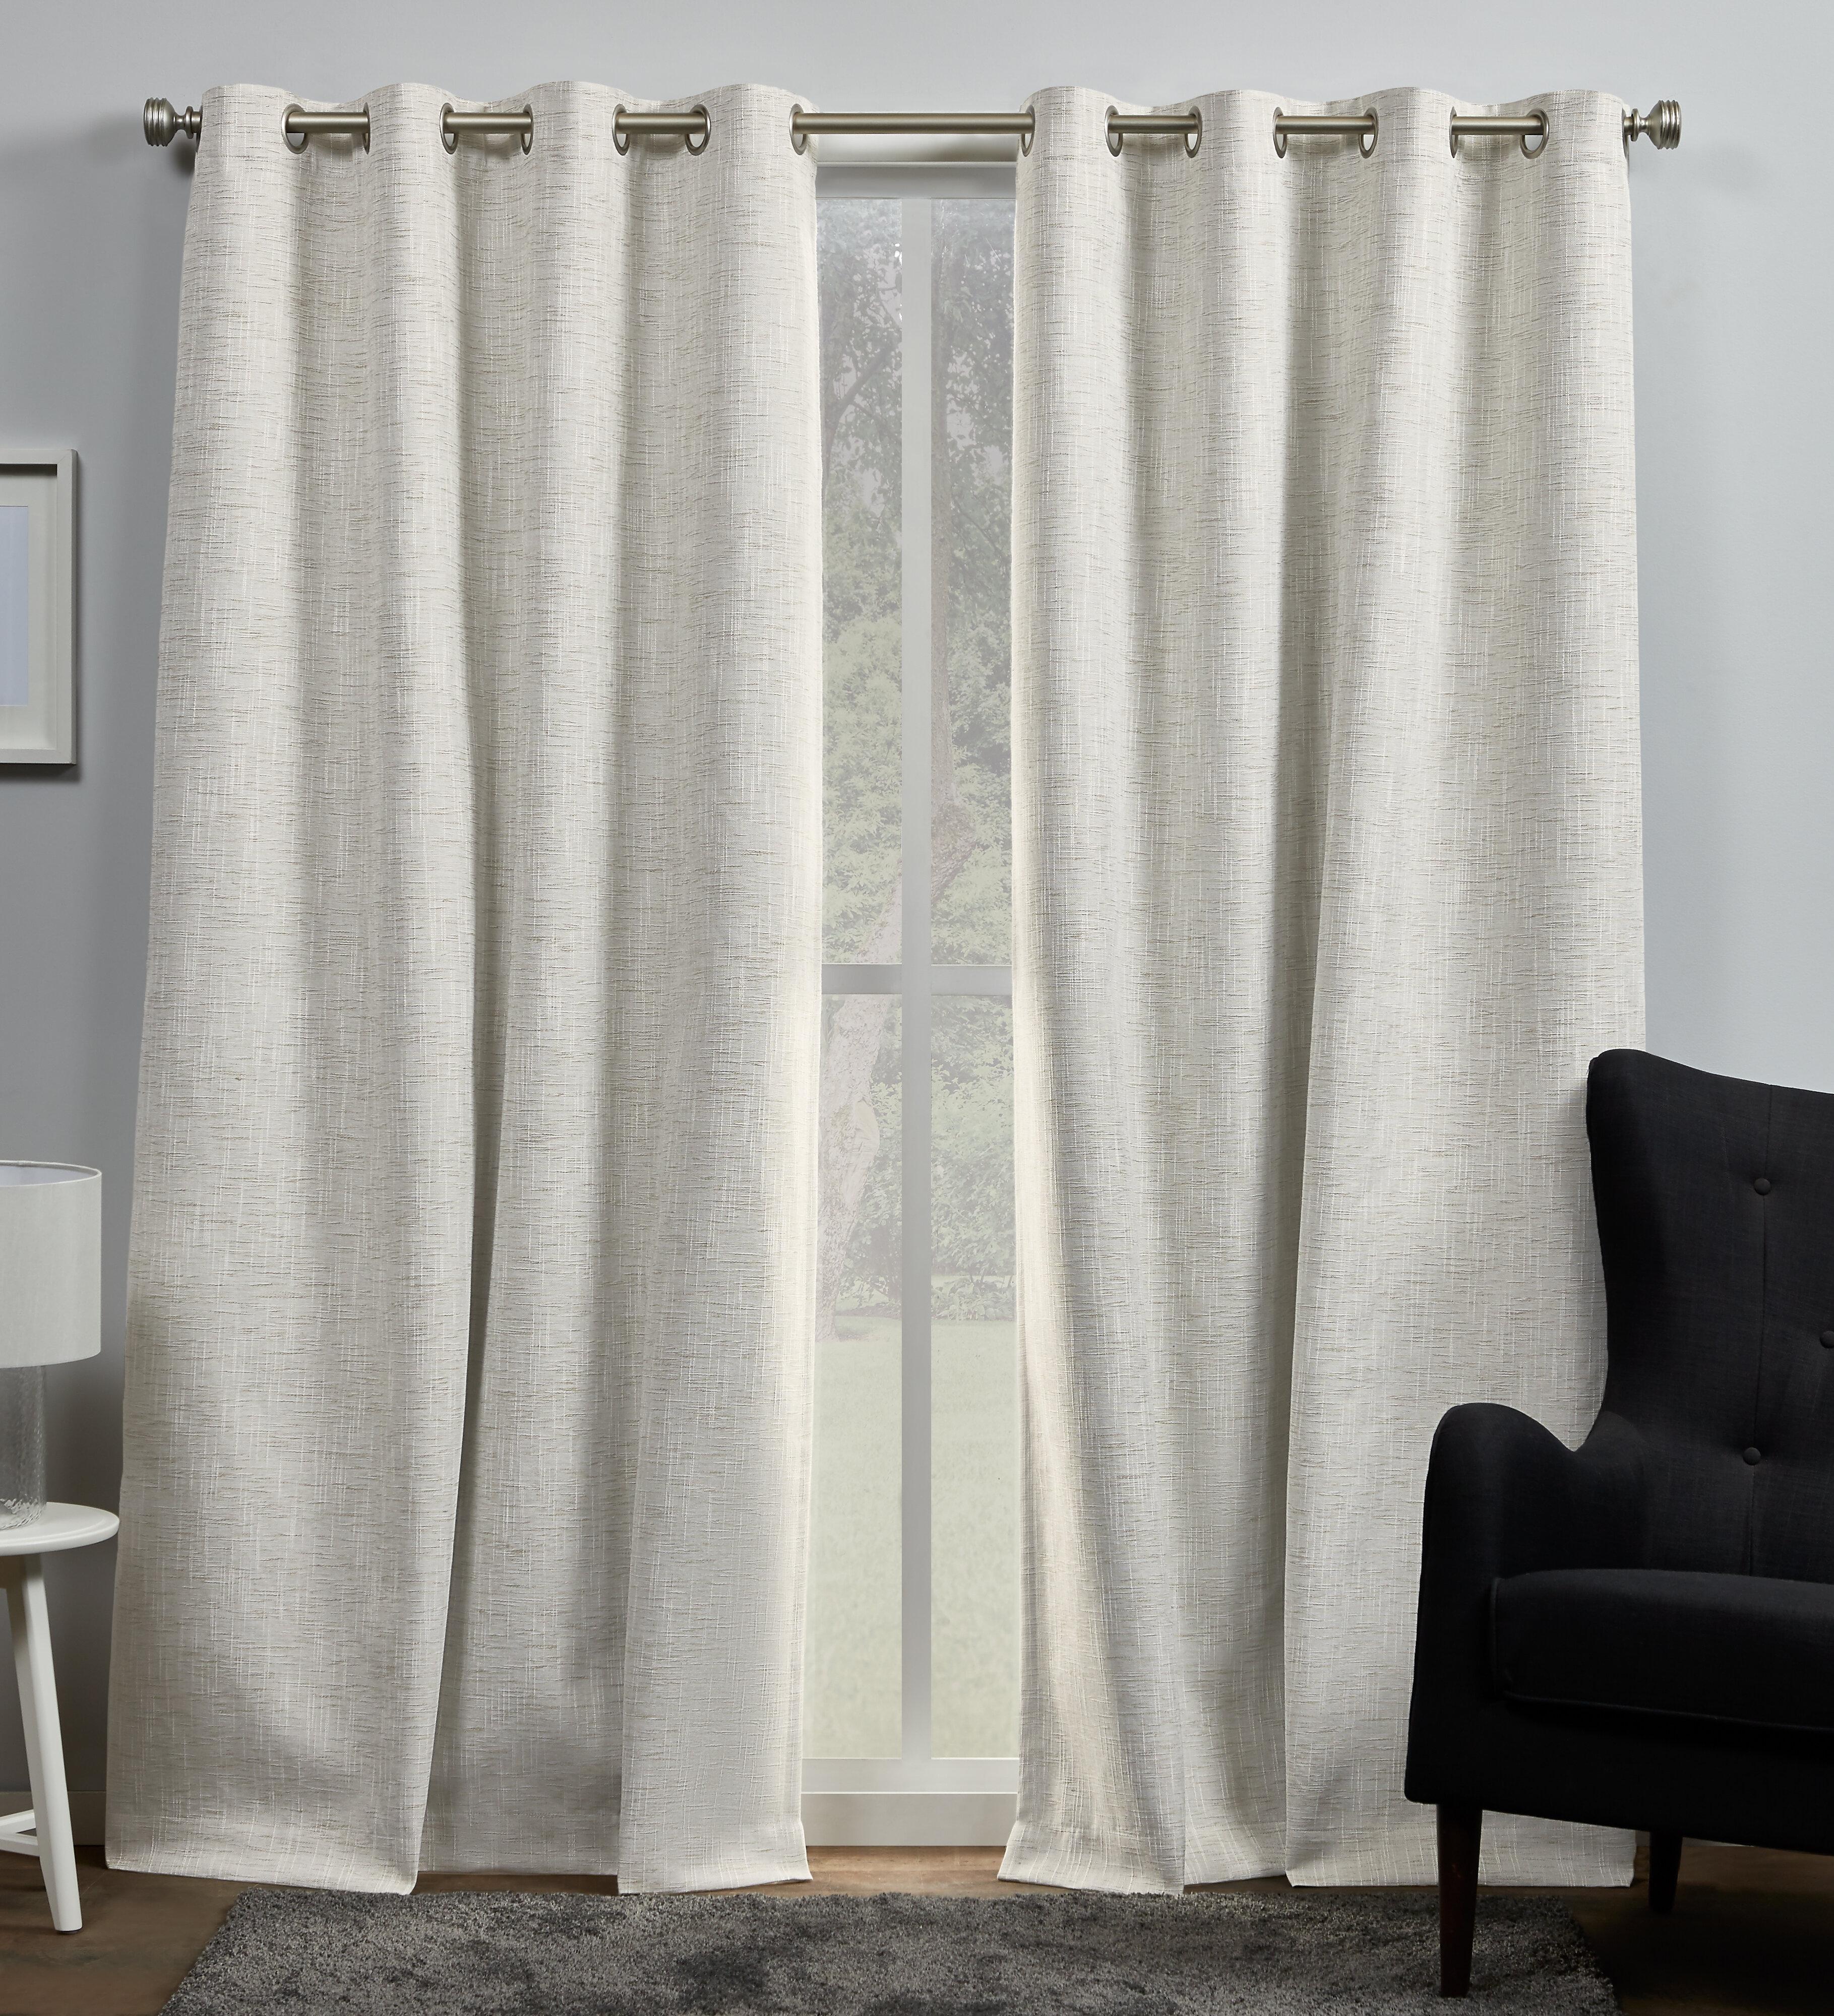 Gracie Oaks Palni Burke Solid Max Blackout Thermal Grommet Curtain Panels Reviews Wayfair